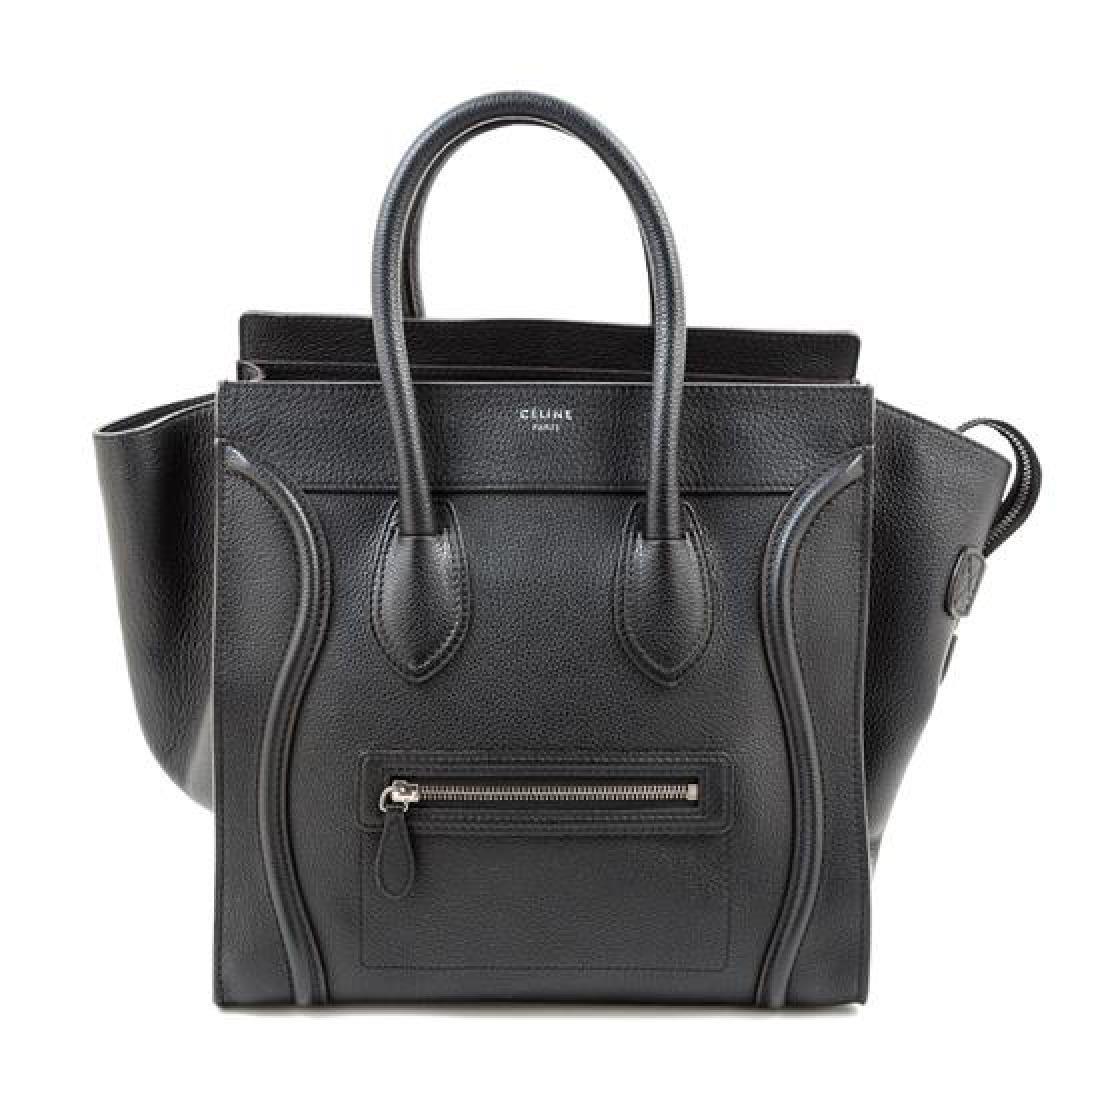 A Celine Black Leather Mirco Luggage Tote,